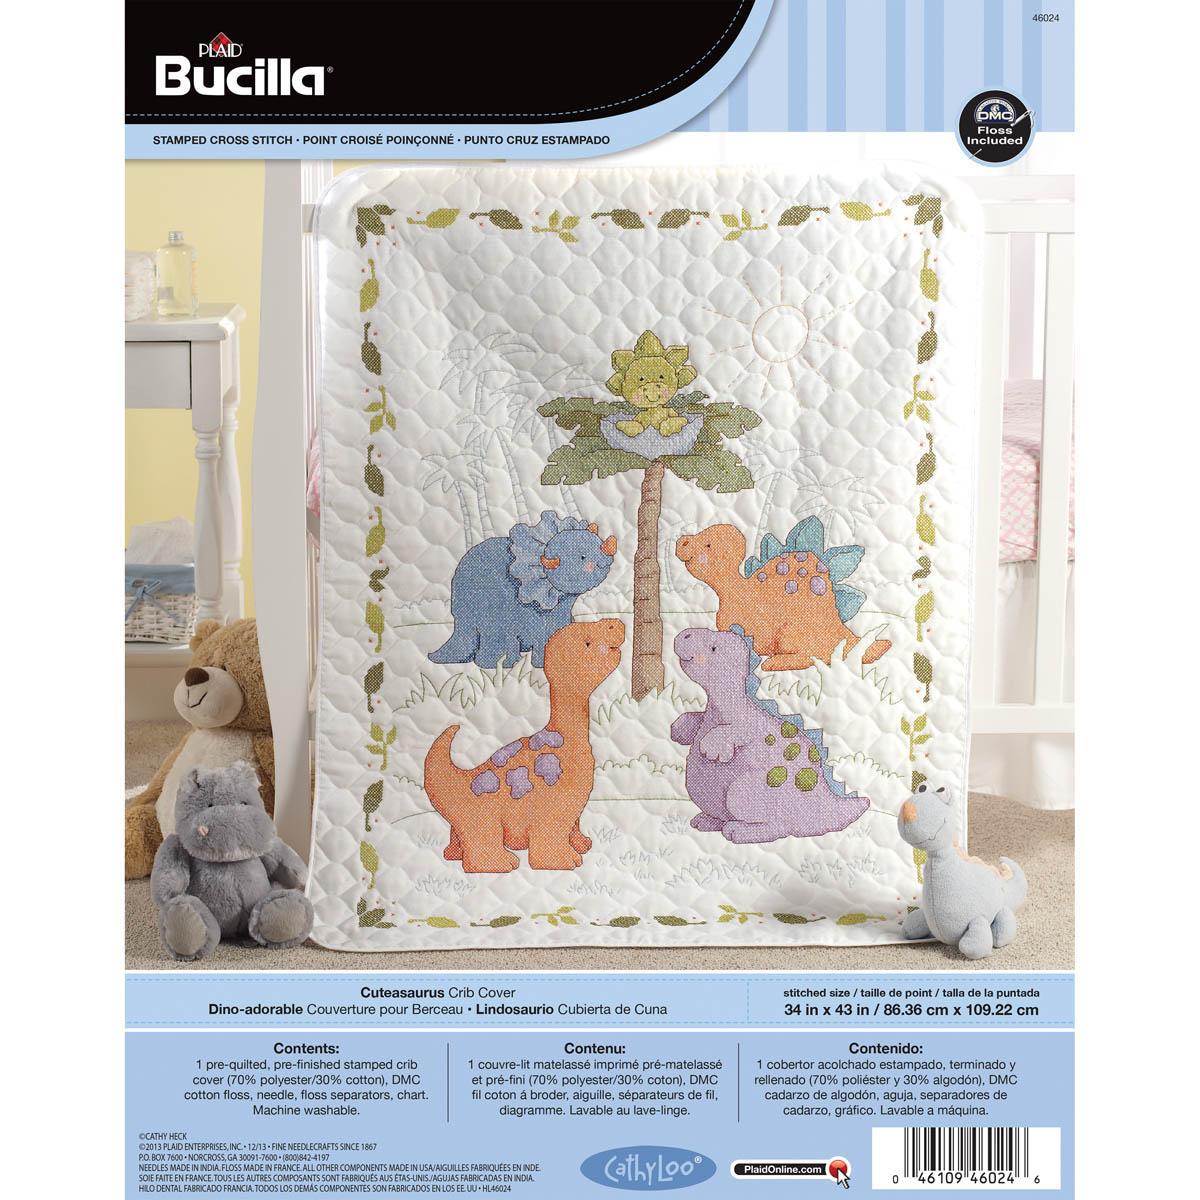 Shop Plaid Bucilla Baby Stamped Cross Stitch Crib Ensembles